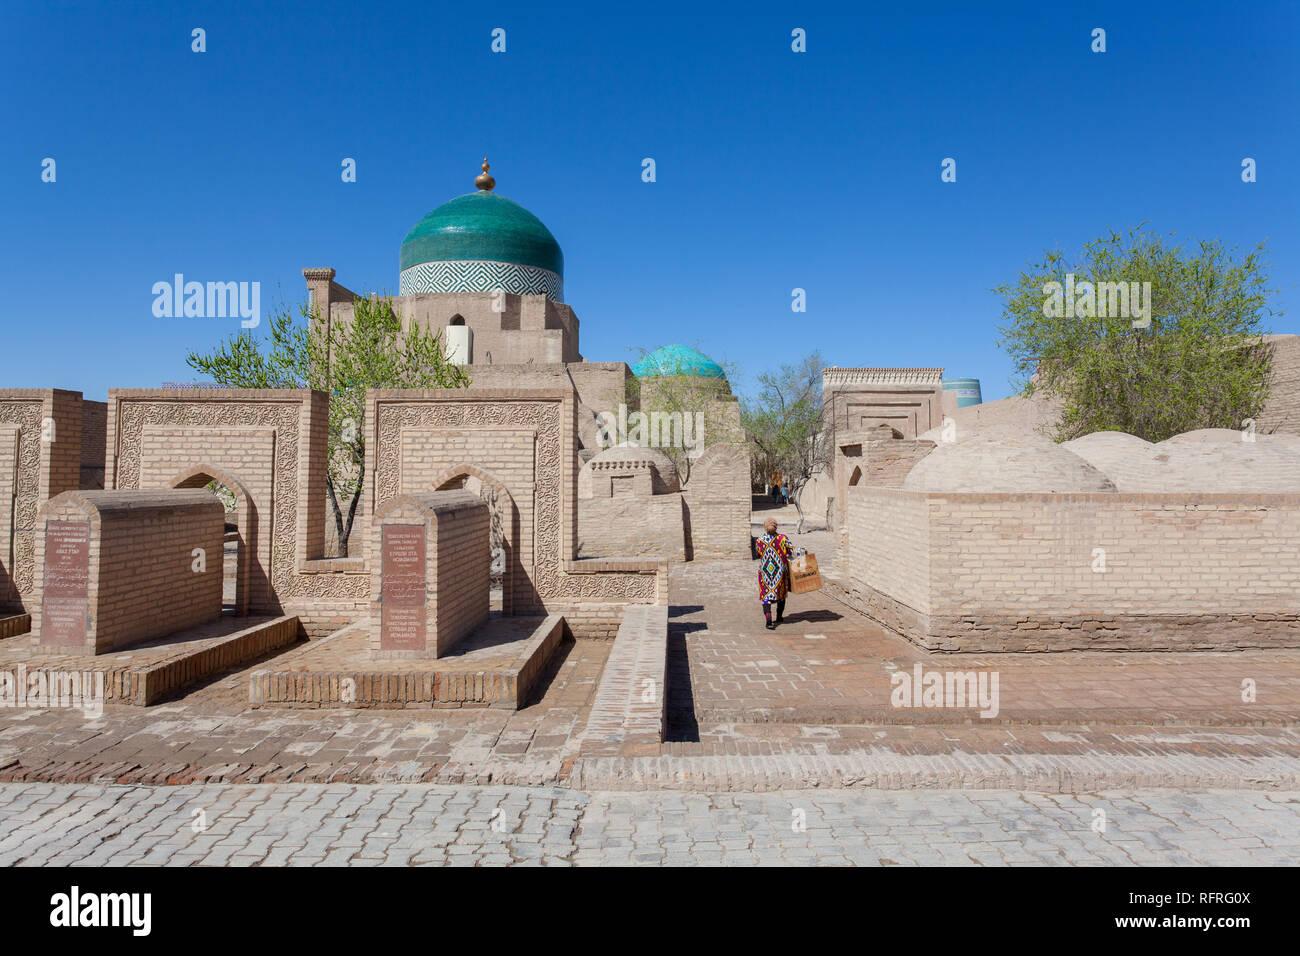 Mausoleum, Kihva, Uzbekistan - Stock Image